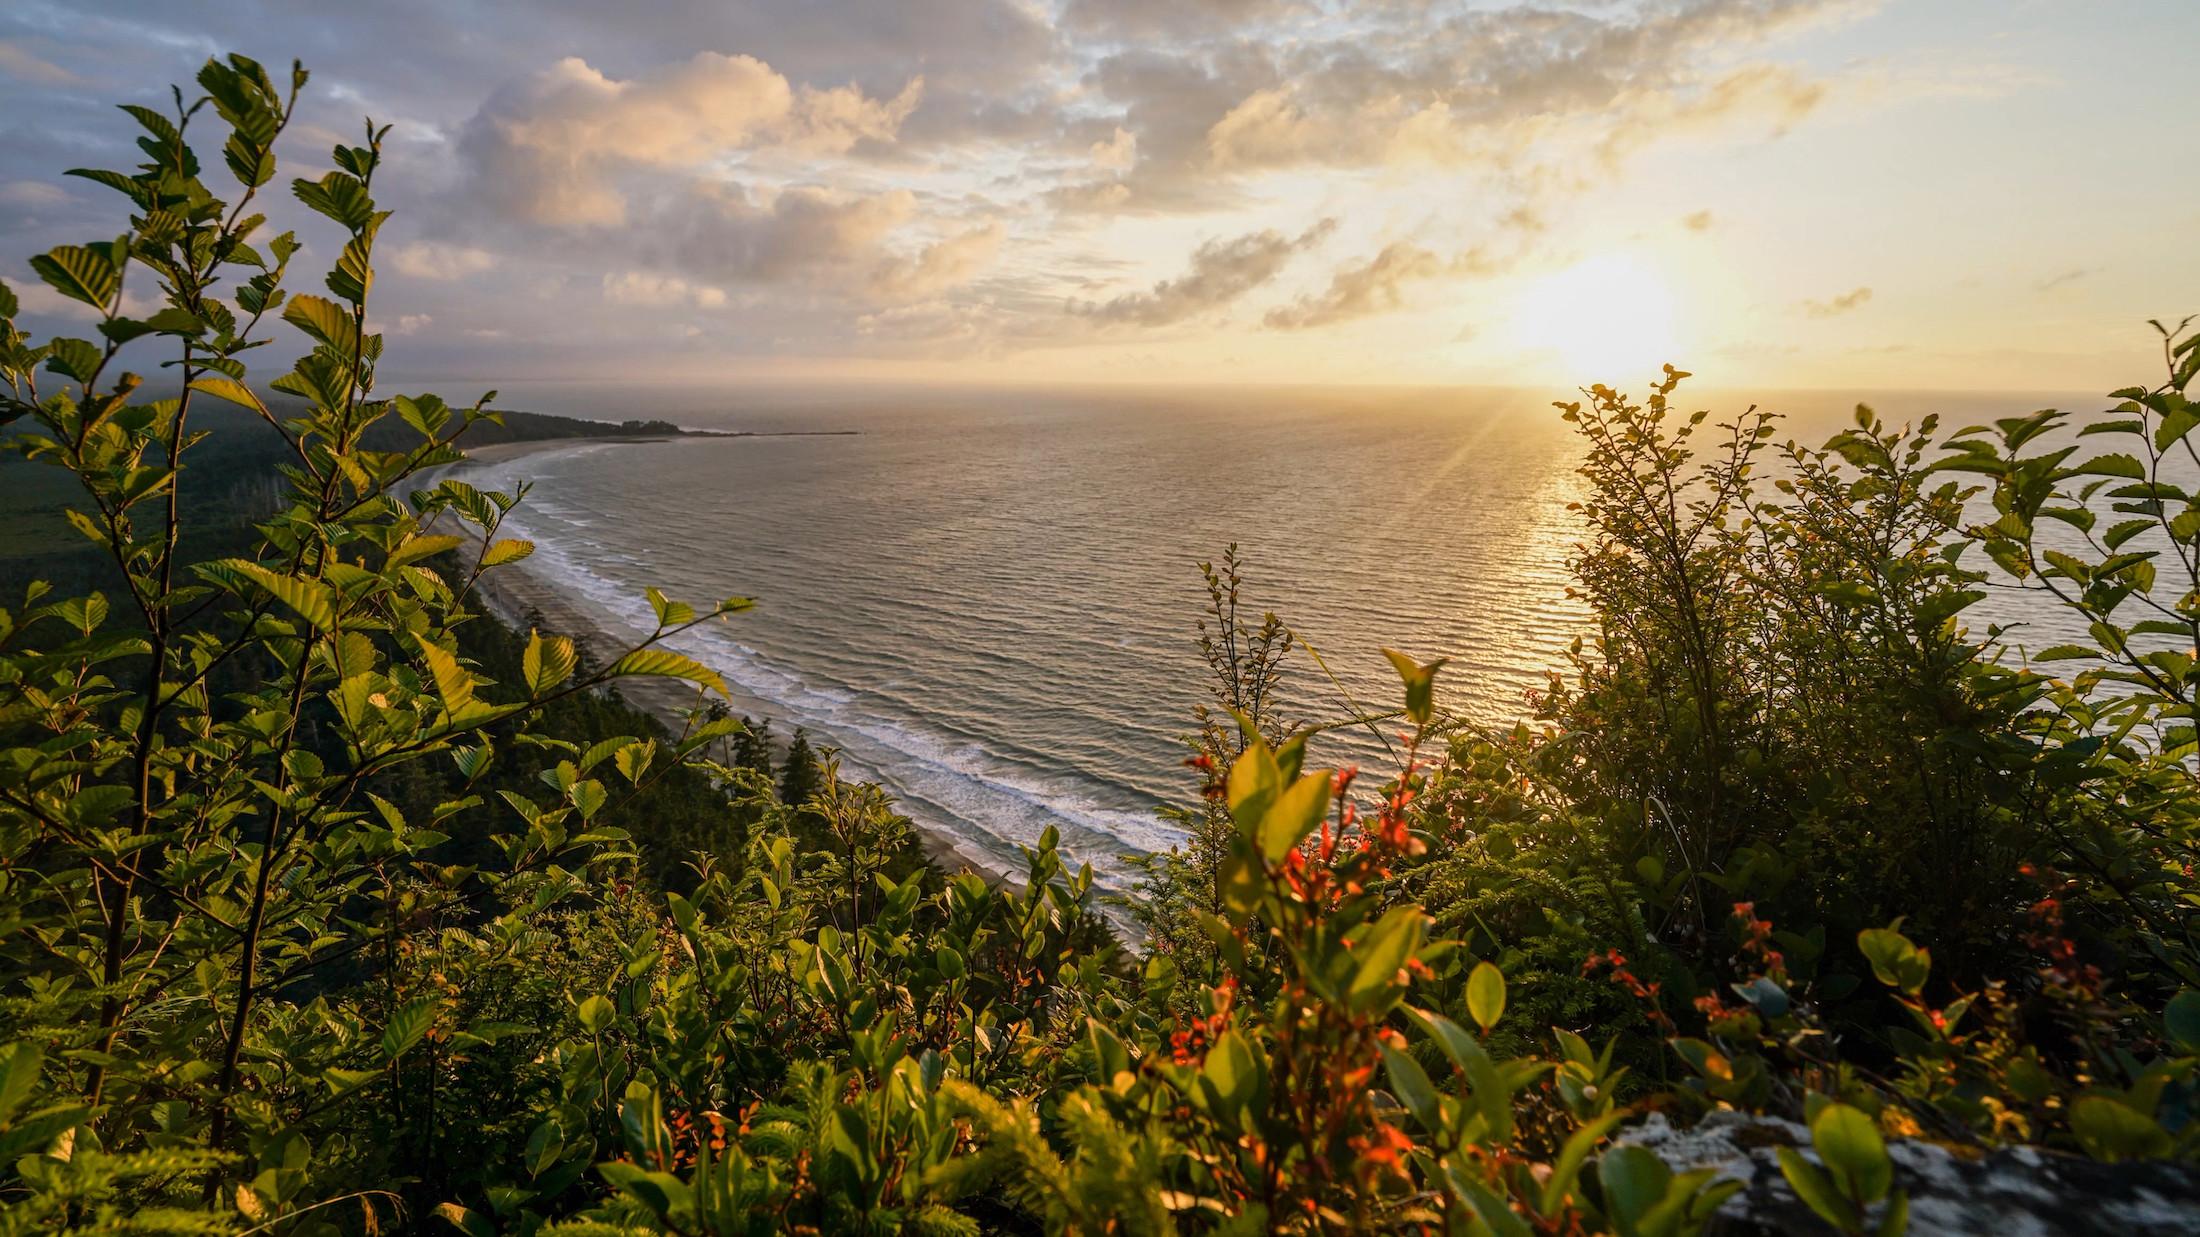 The picturesque Haida Gwaii coastline. Photo: Gregory Gould